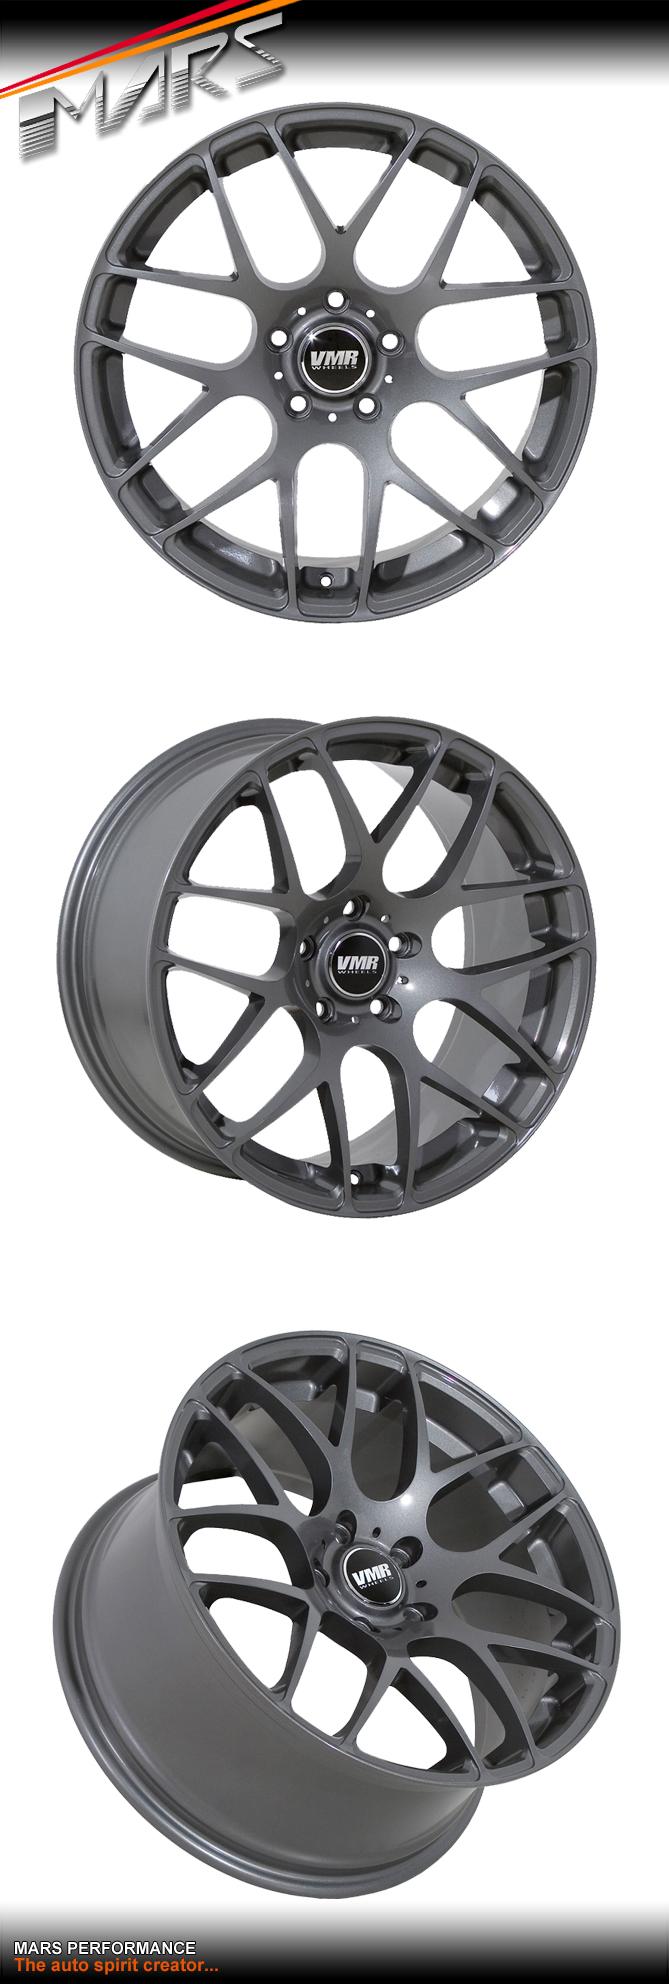 Vmr V710 4 X 20 Inch Gun Metal Stag Concave Alloy Wheels